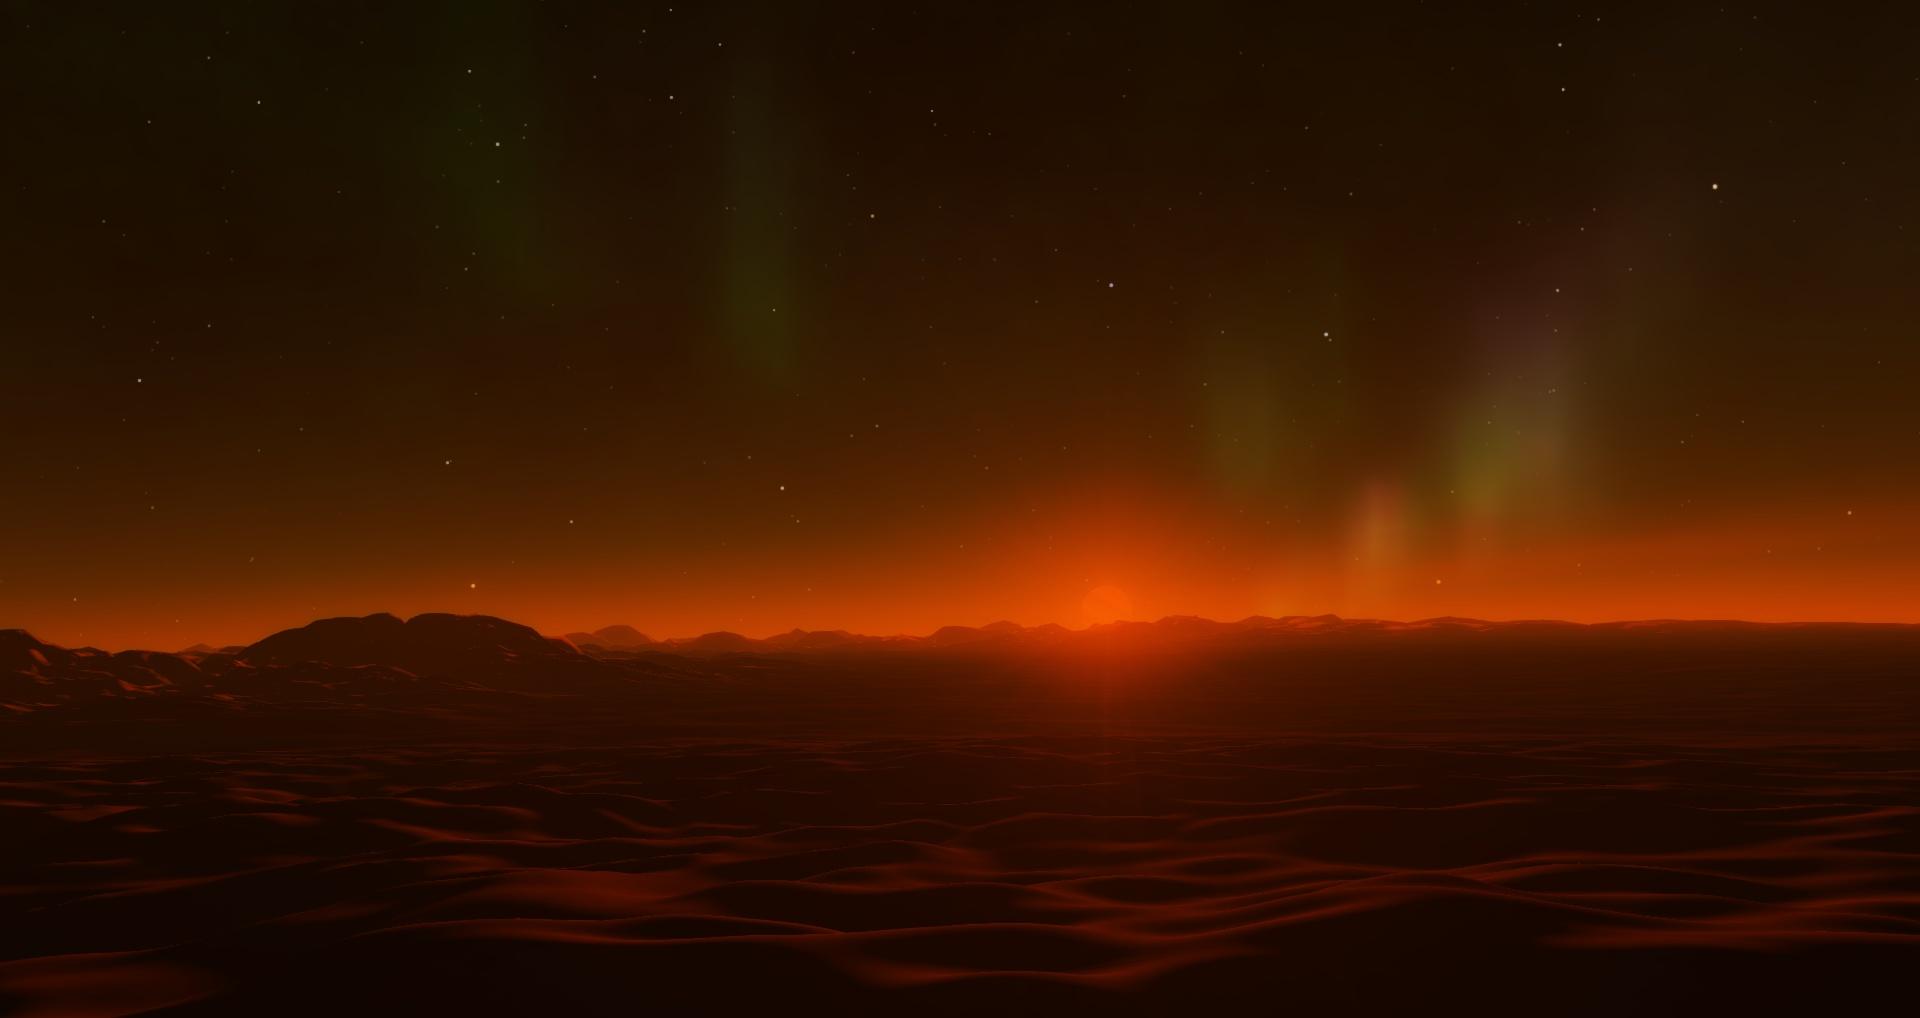 brown dwarf habitable planet - photo #1